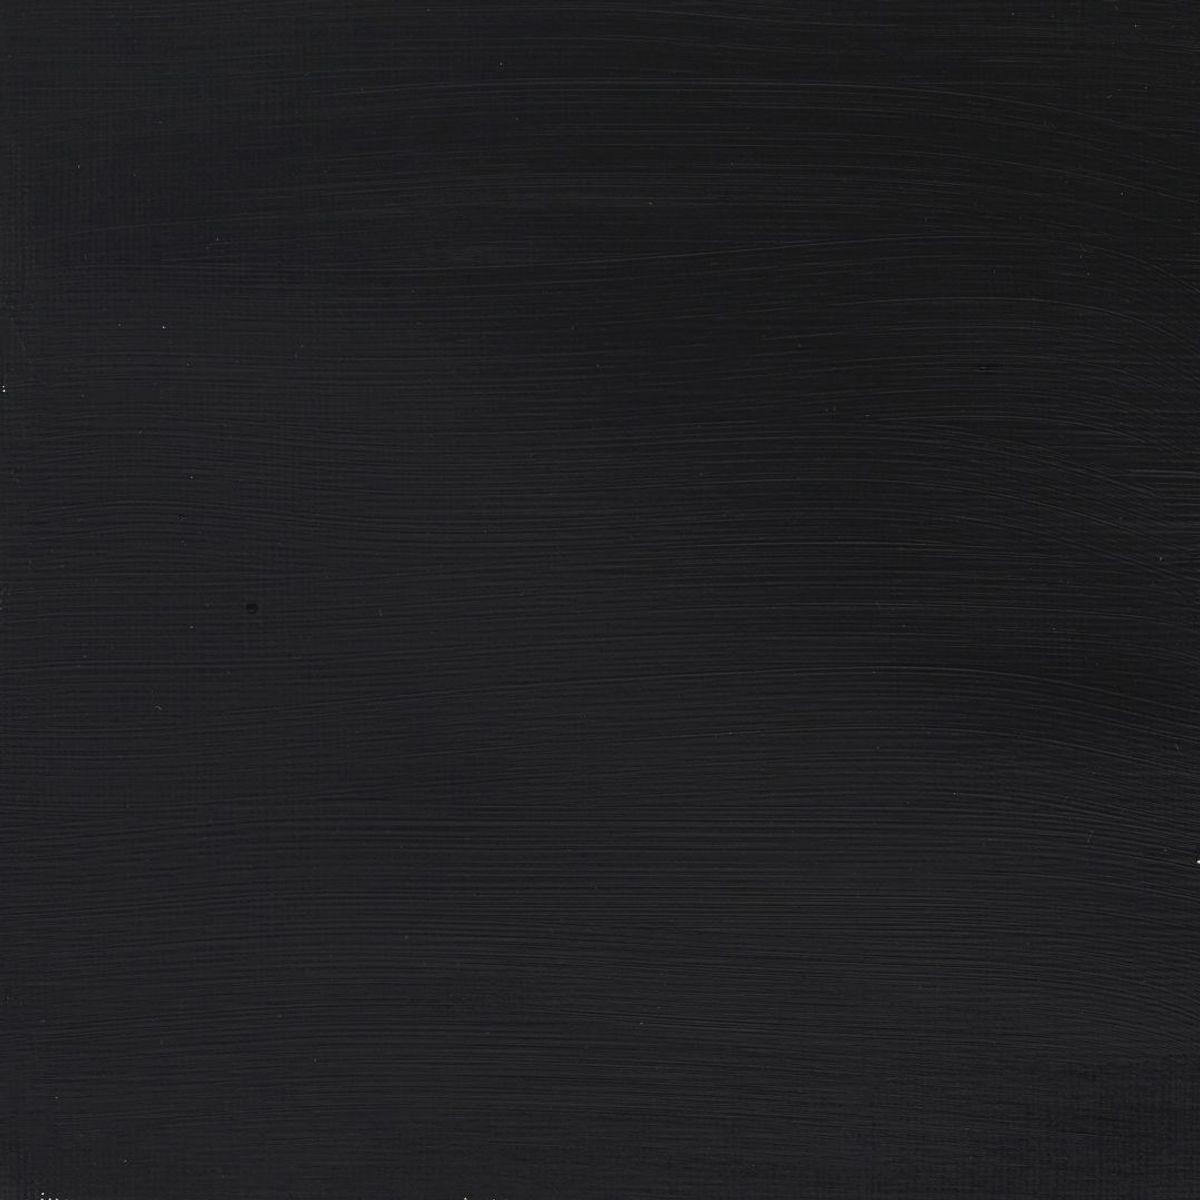 WINSOR AND NEWTON GALERIA ACRYLIC COLOUR - TUBE OF 60 ML - MARS BLACK (386)